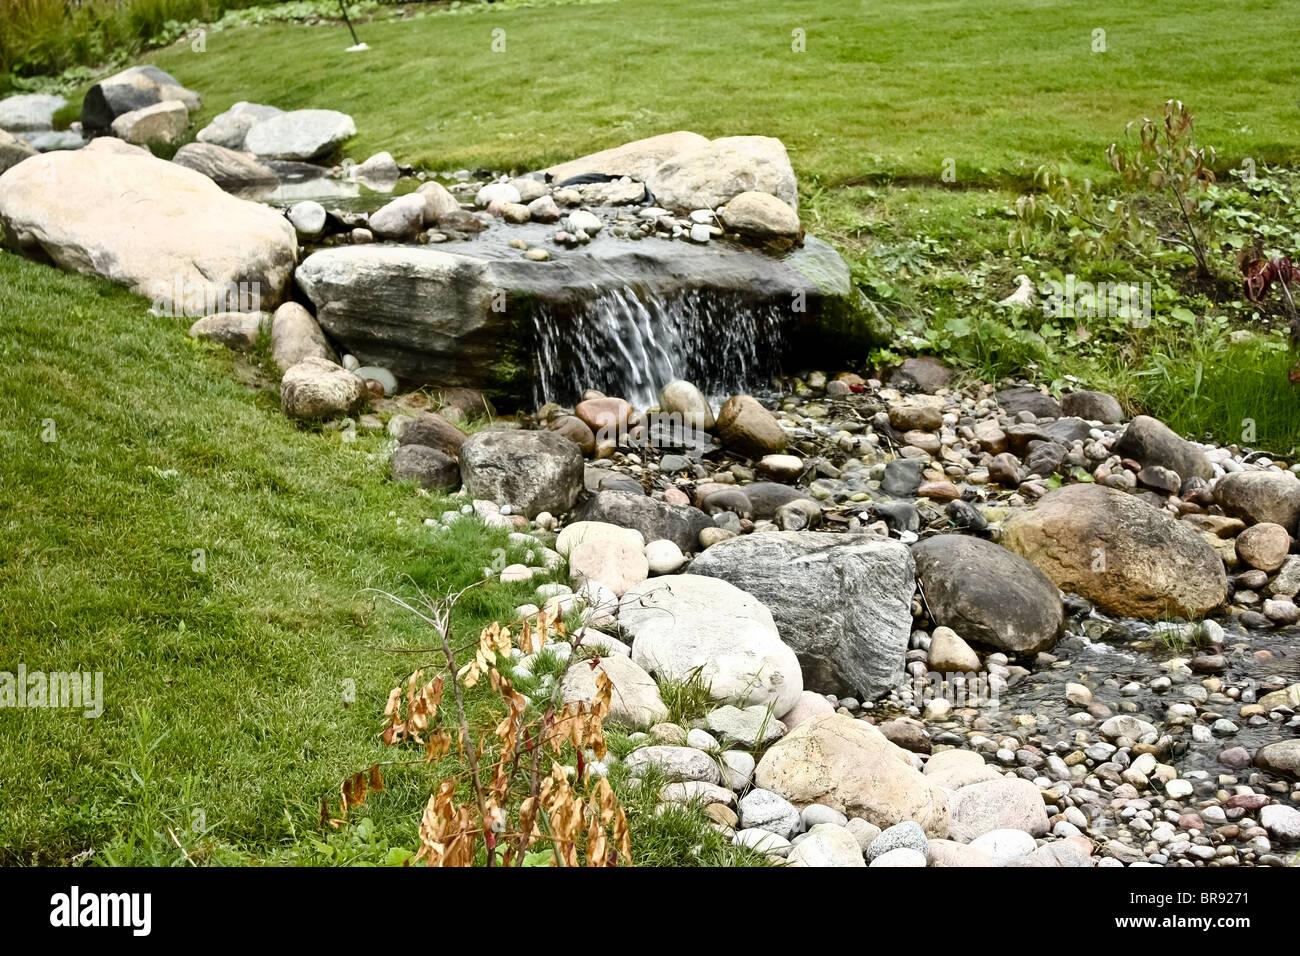 rock running water grass - Stock Image